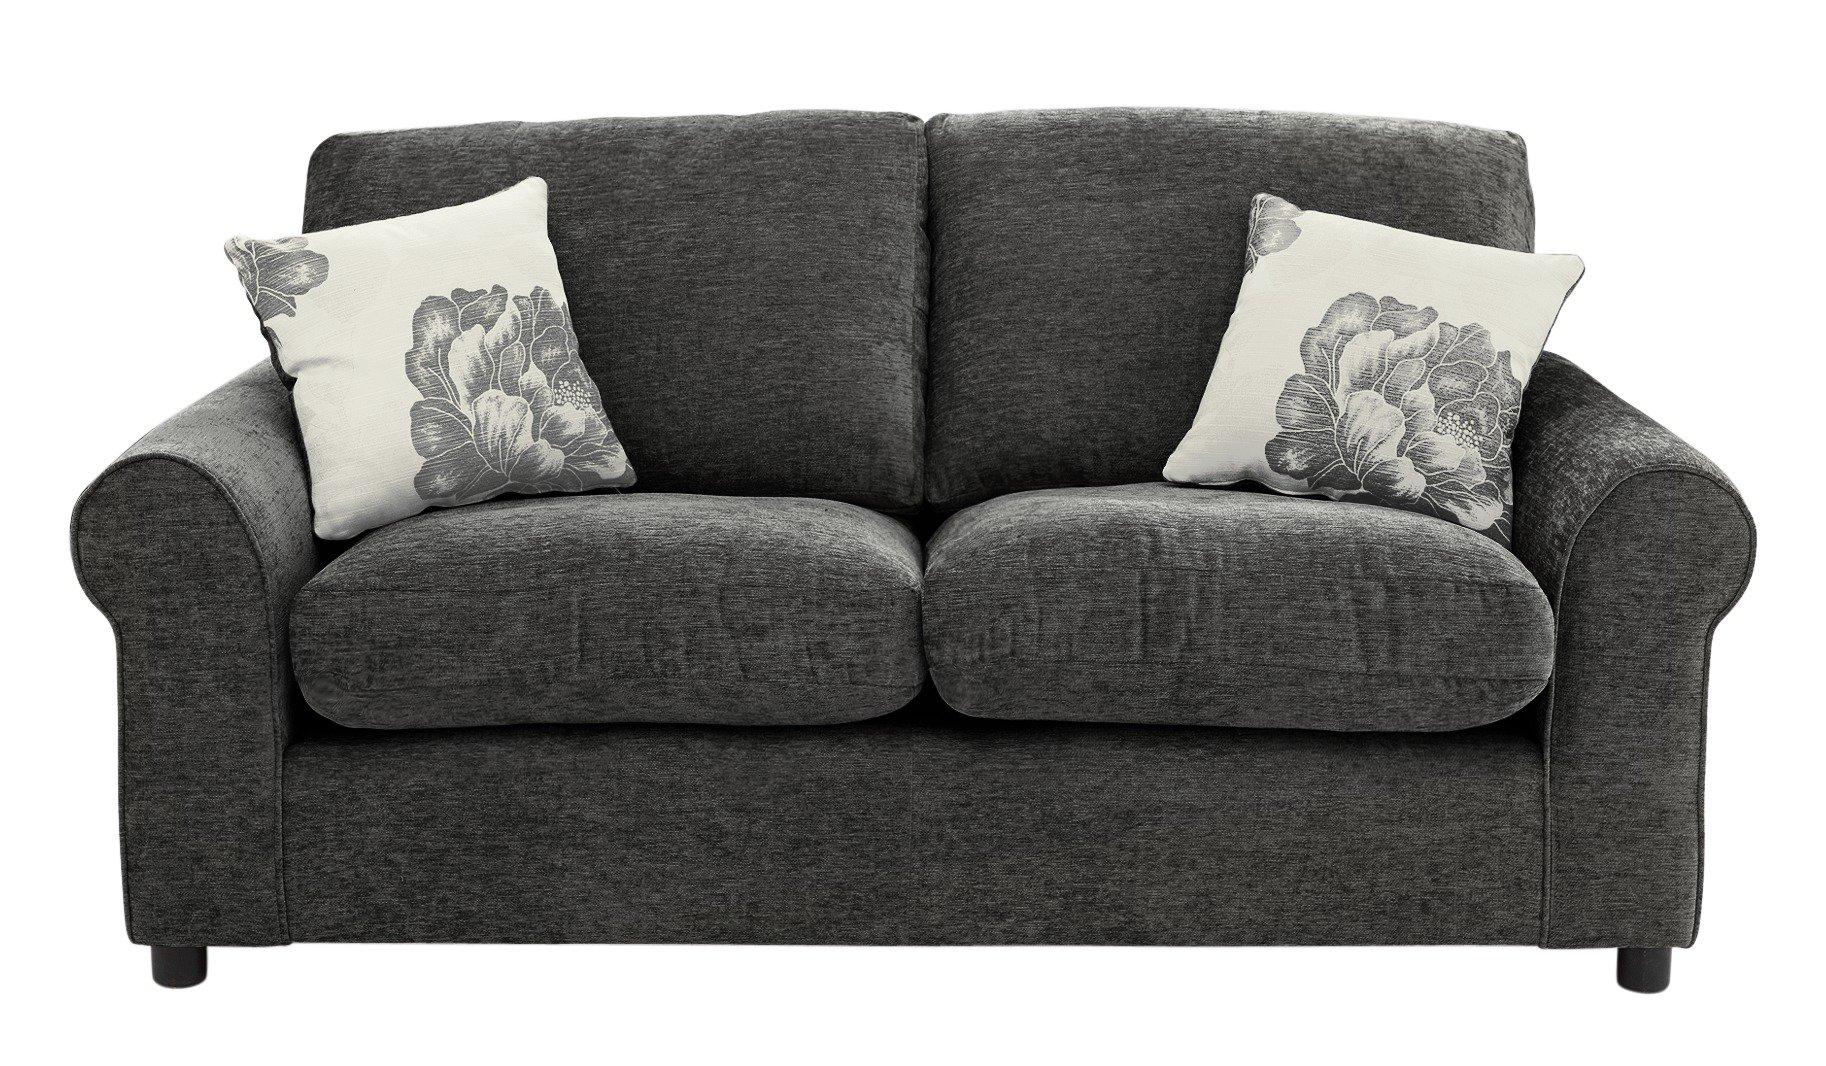 fabric chesterfield sofa argos friheten corner bed skiftebo beige sale on home tessa 2 seater charcoal